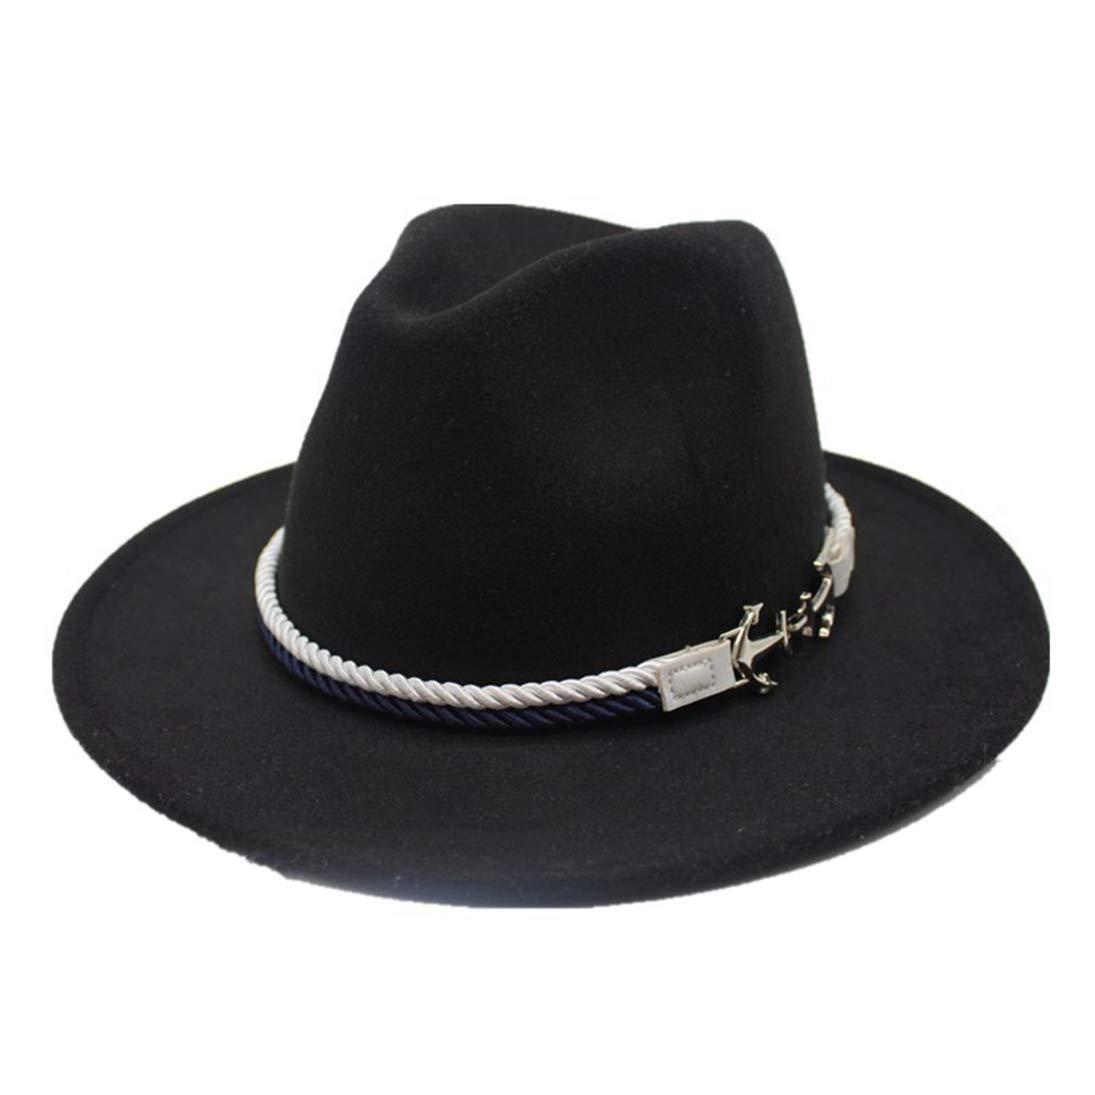 Fedora Hats Classic Timeless Warm Wool Felt Hat Winter Unisex Elegant Vintage Wide Brim Jazz Cap Bowler Hat